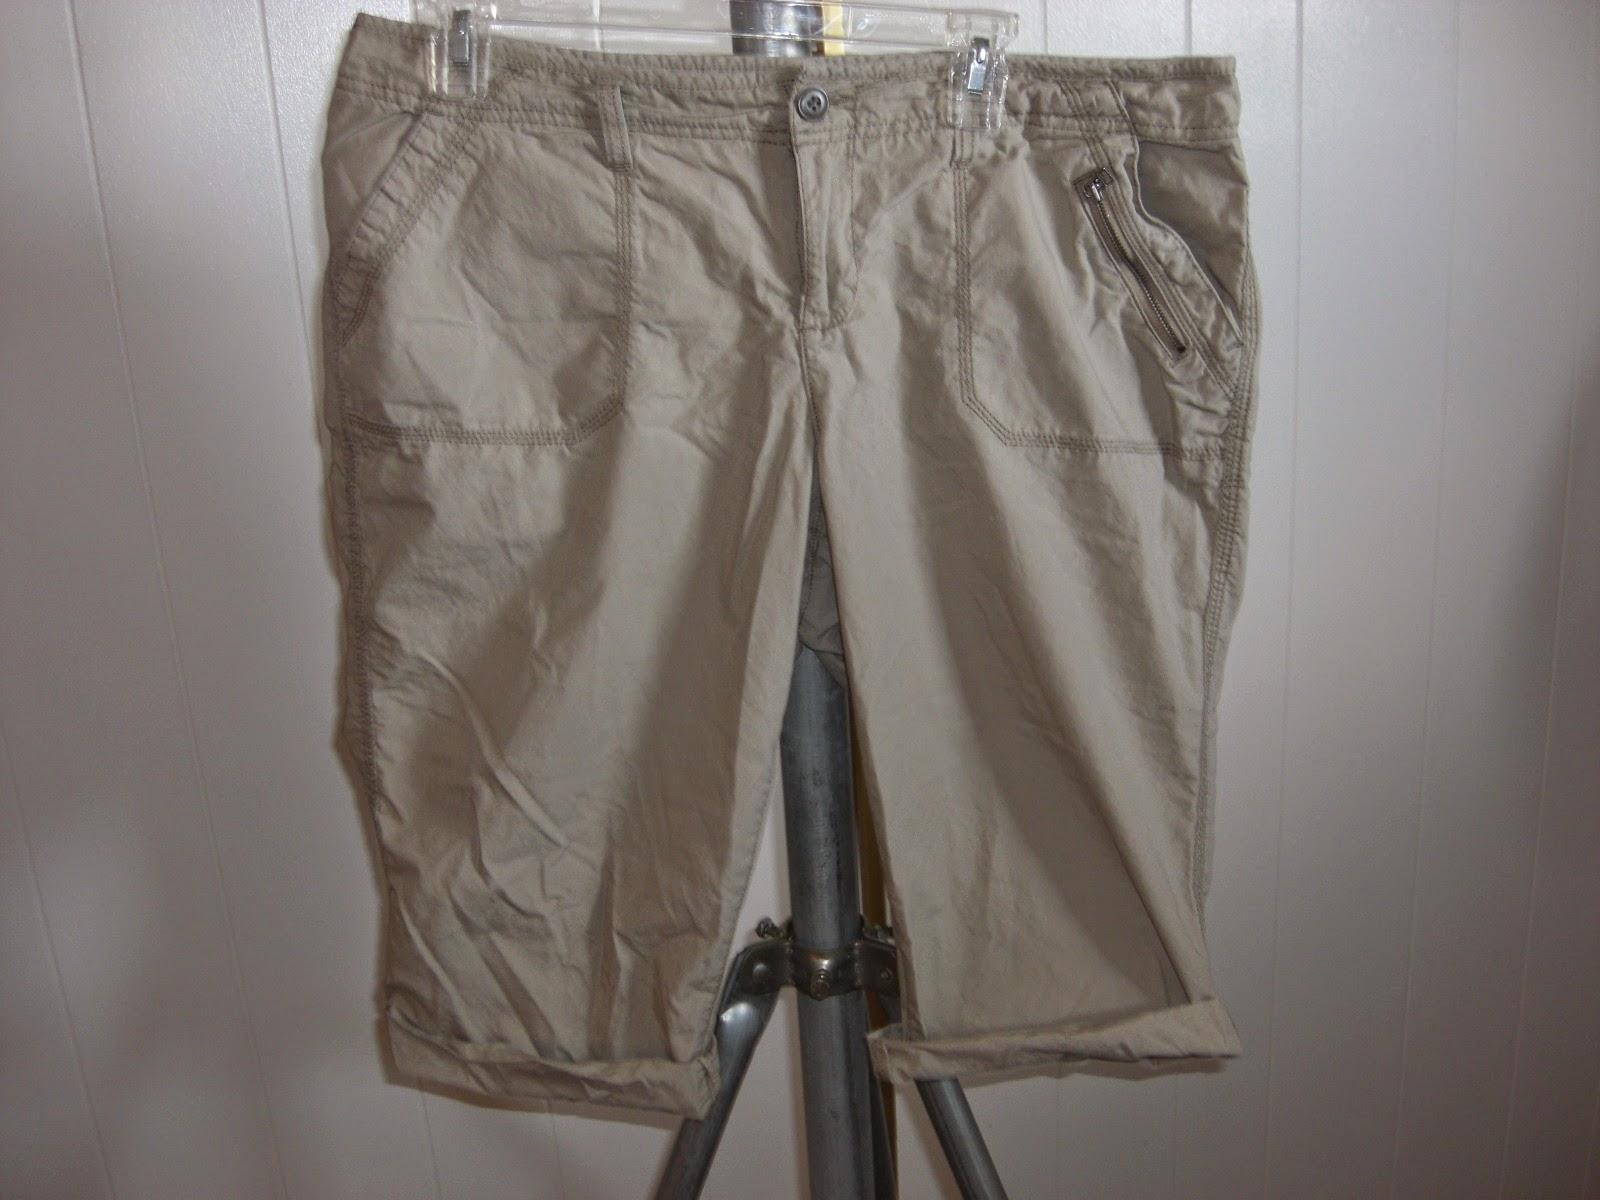 http://bargaincart.ecrater.com/p/18669977/womens-petite-sonoma-modern-bermuda-4